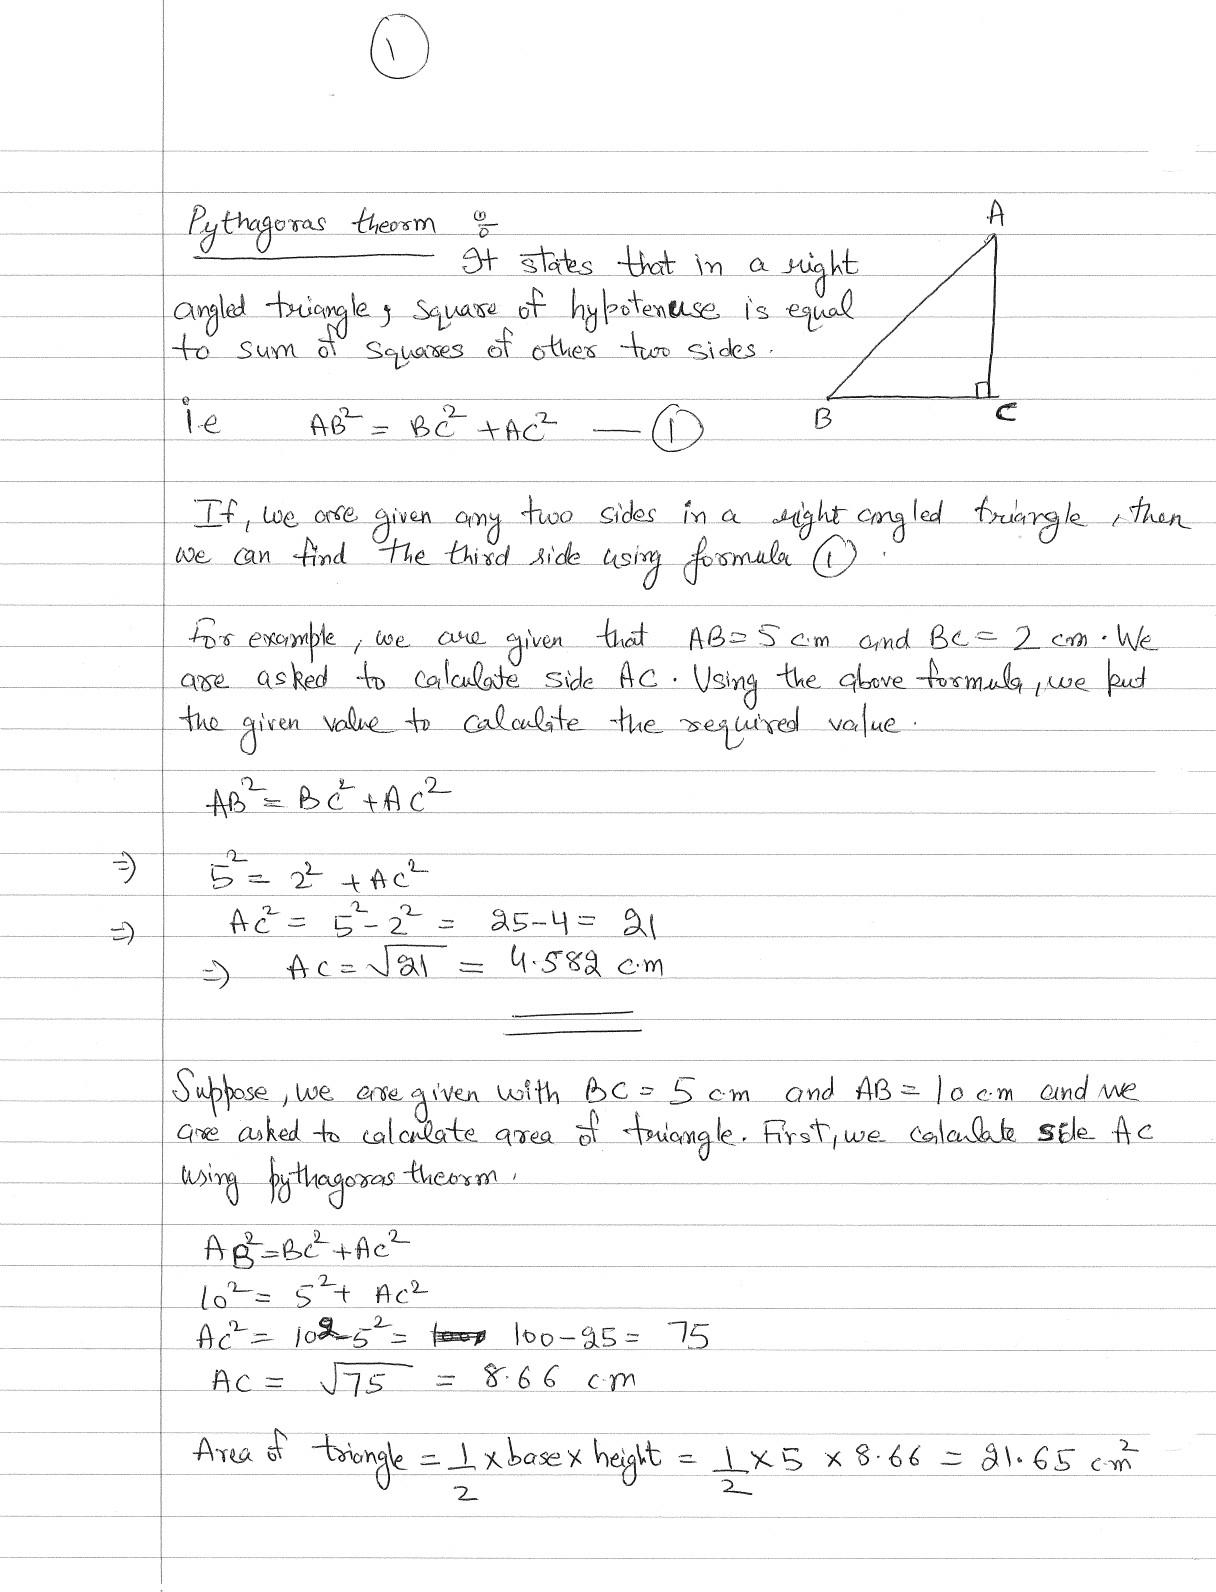 Detail about Pythagoras Theorm